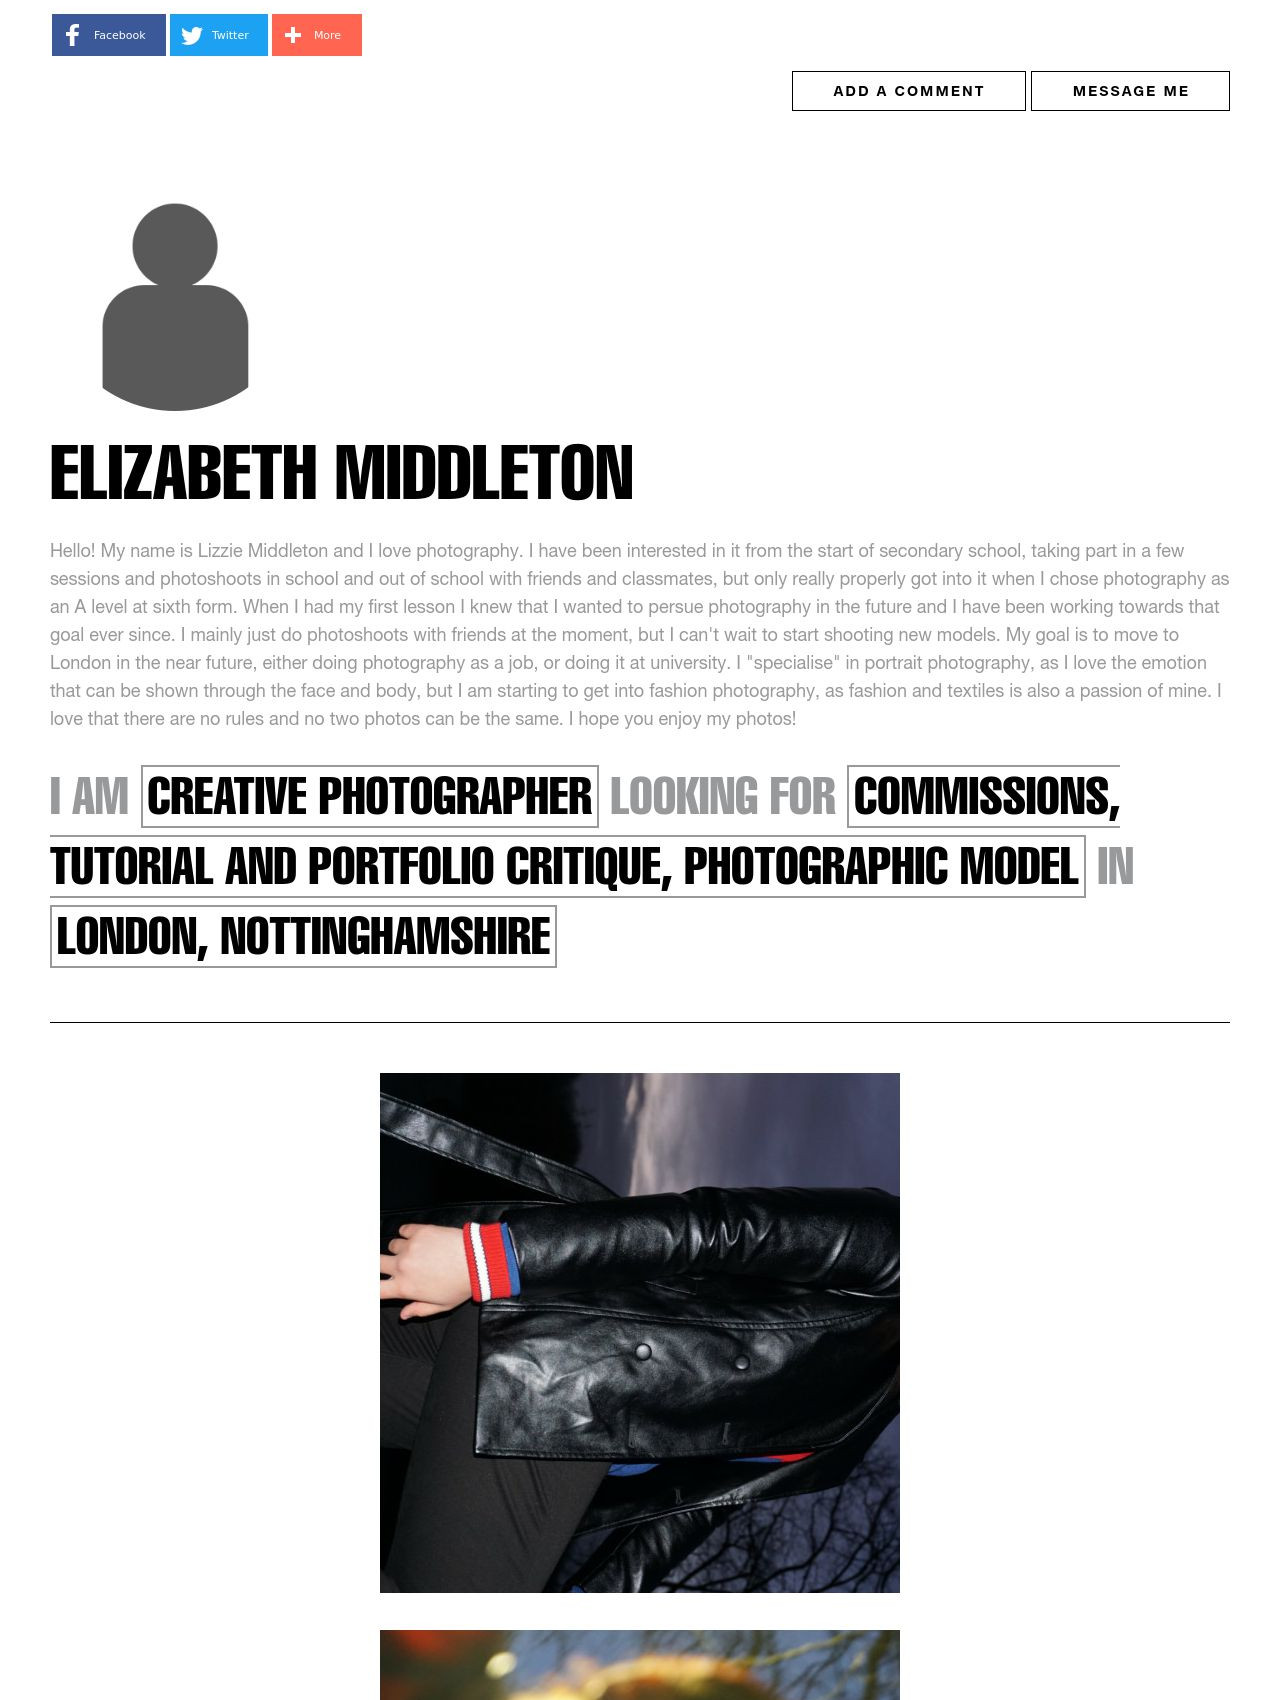 Elizabeth Middleton